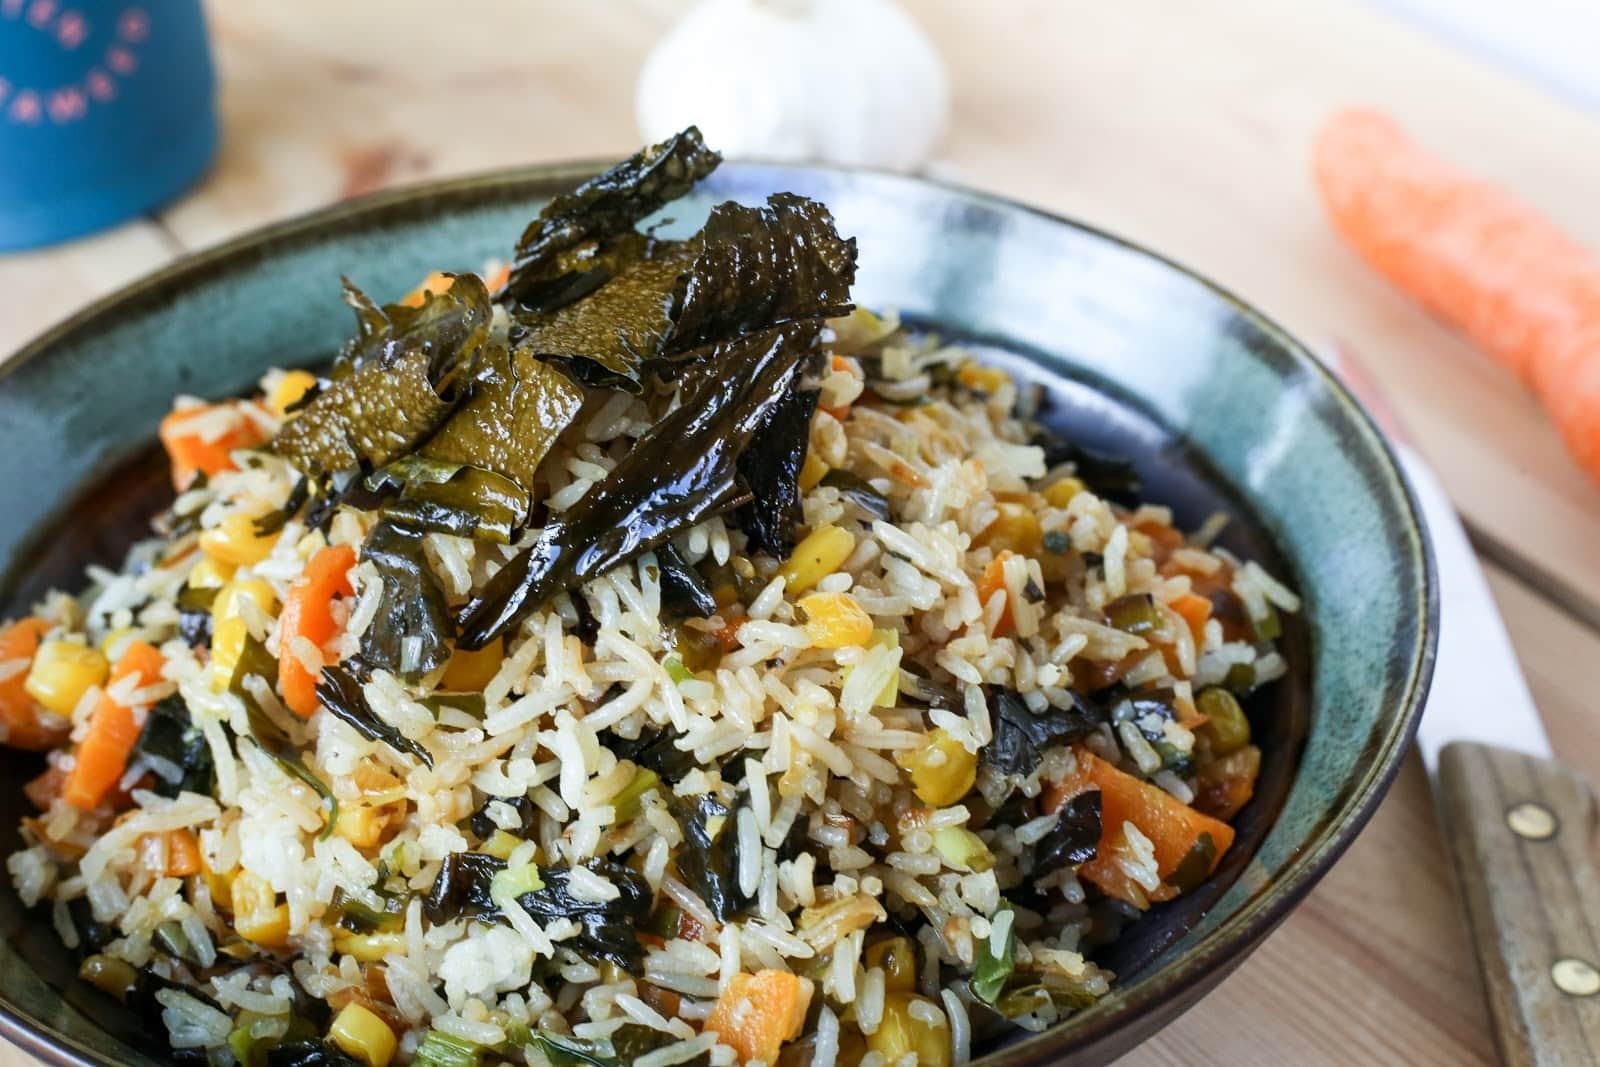 Image of winged kelp fried rice